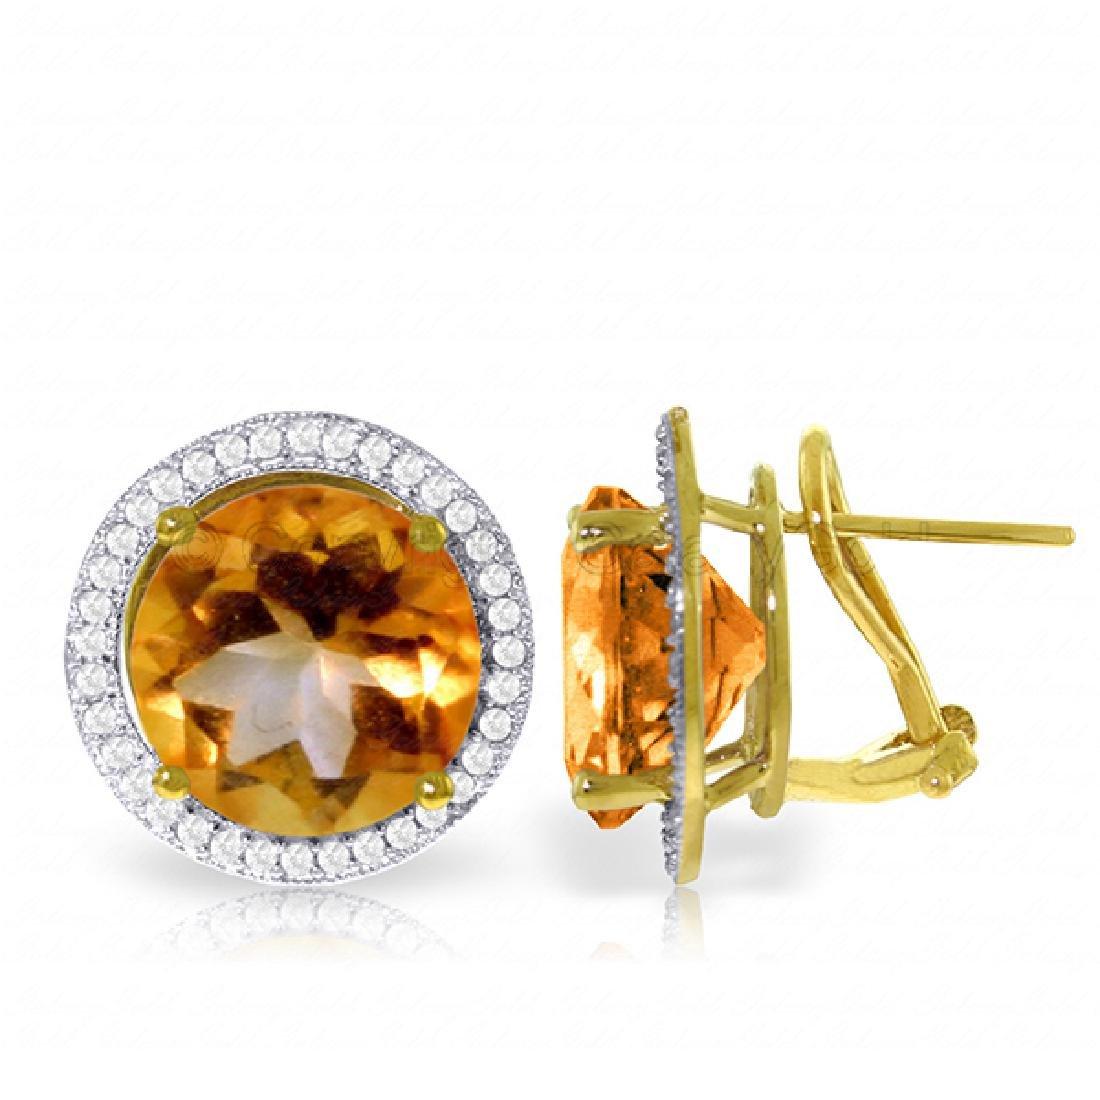 Genuine 12.4 ctw Citrine & Diamond Earrings Jewelry